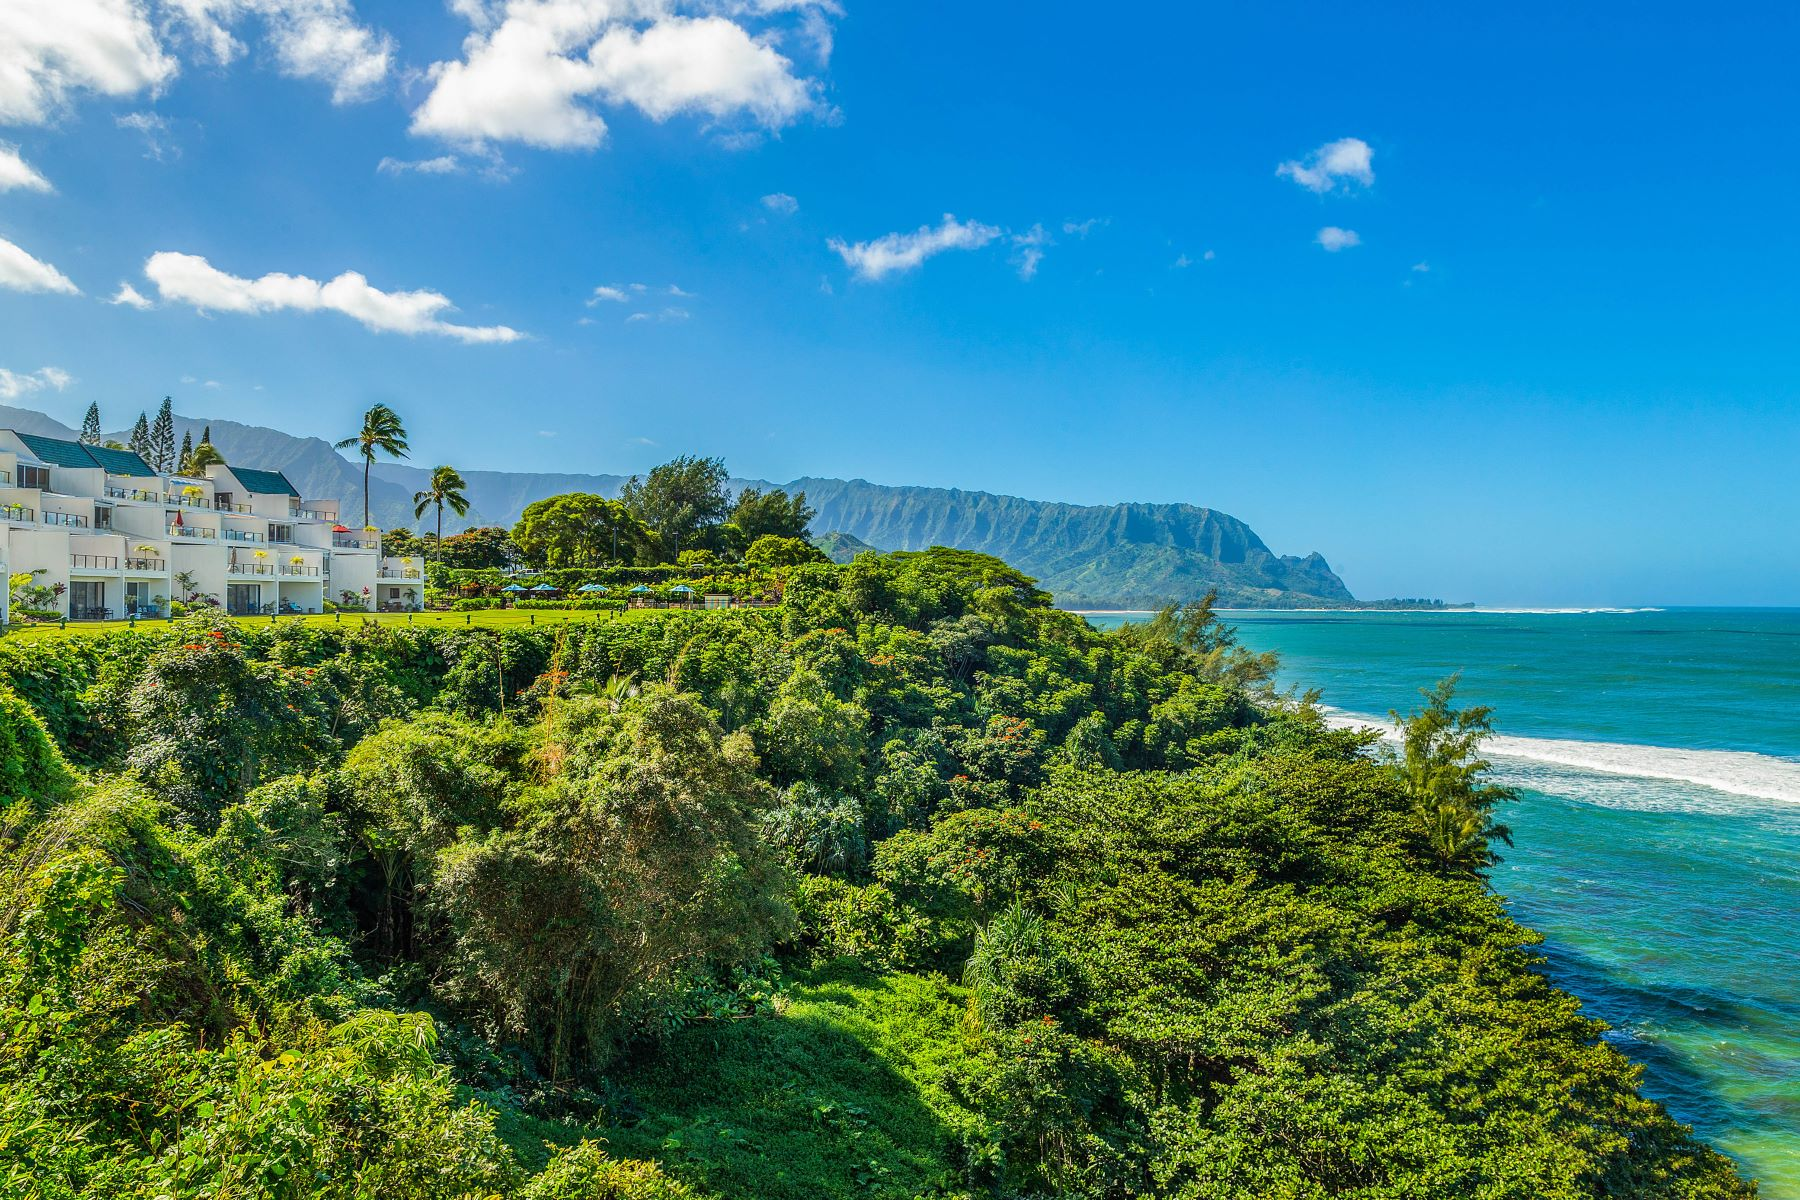 Condominiums for Sale at 5454 KA HAKU RD #401 PRINCEVILLE, HI 96722 5454 KA HAKU RD #401 Princeville, Hawaii 96722 United States